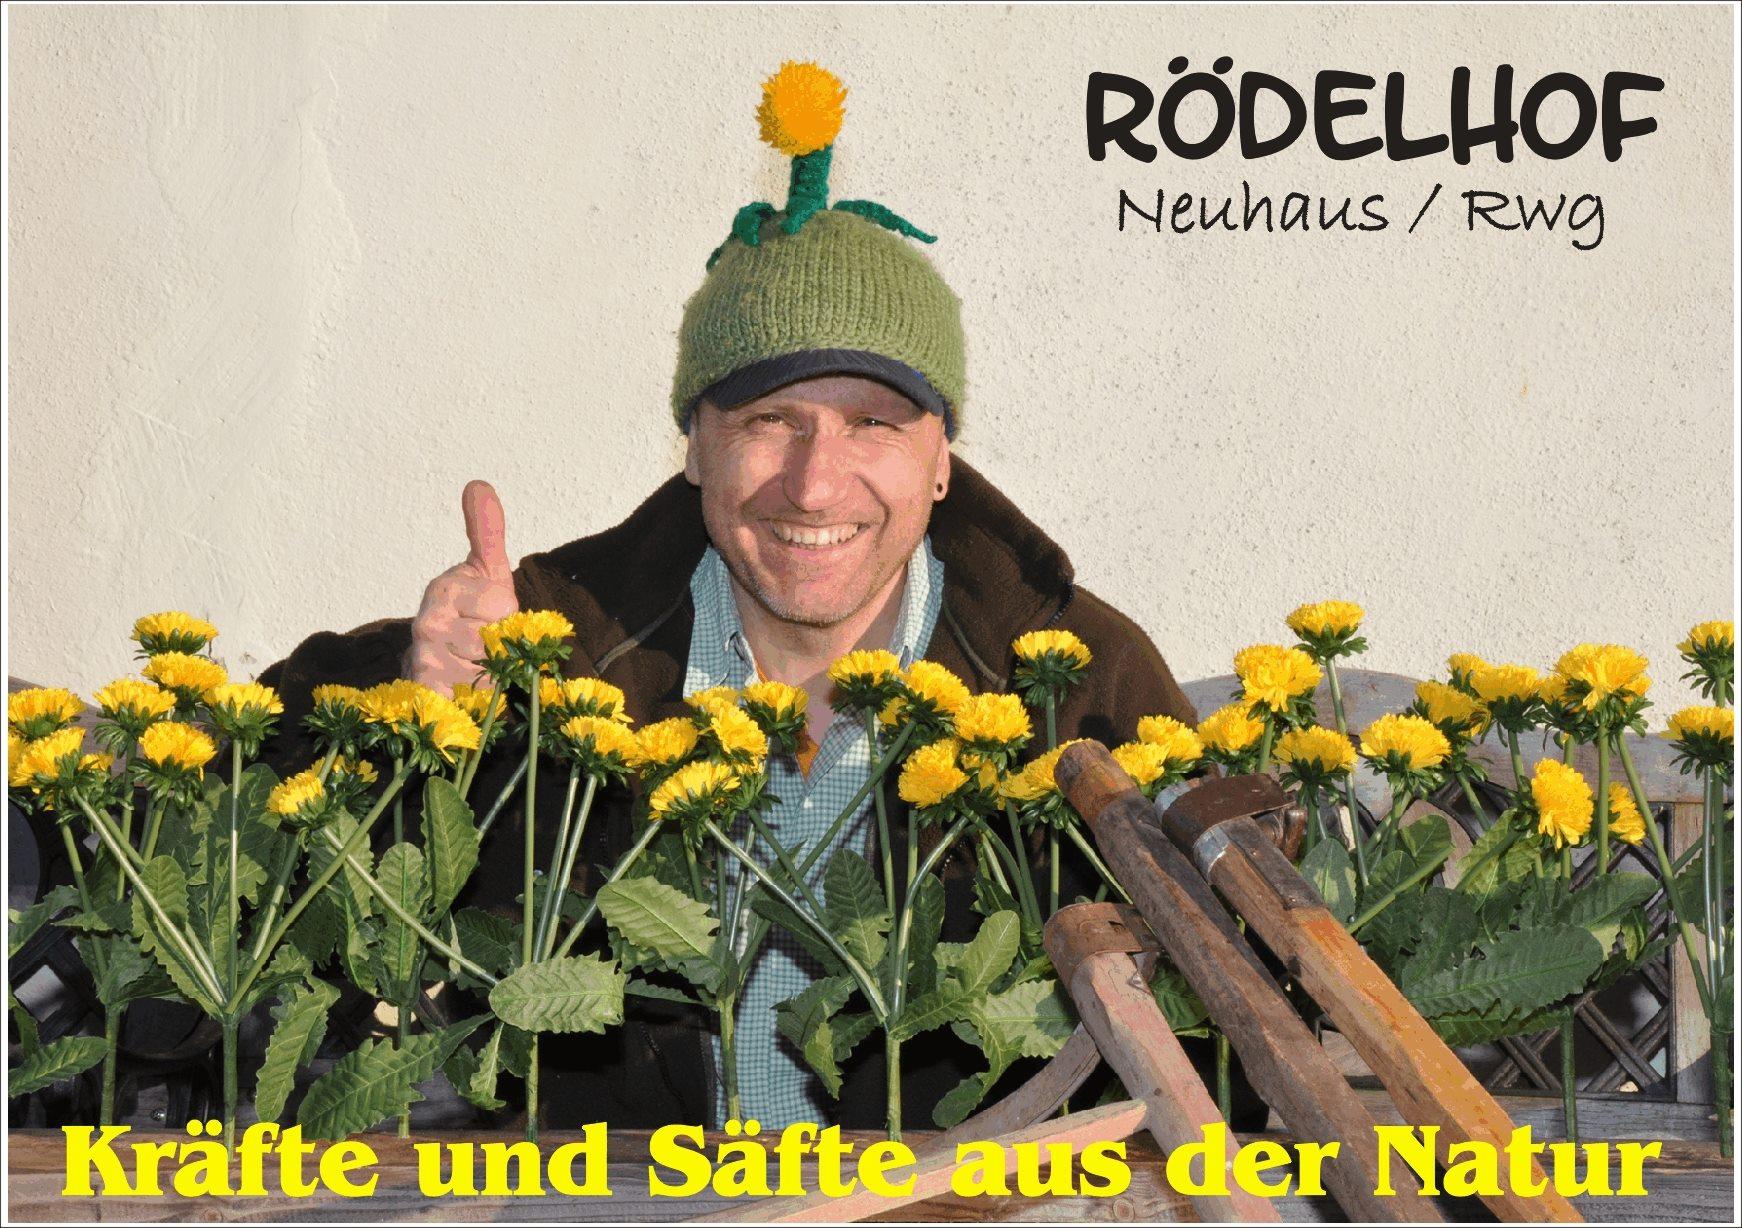 Rödelhof Neuhaus a.Rwg.